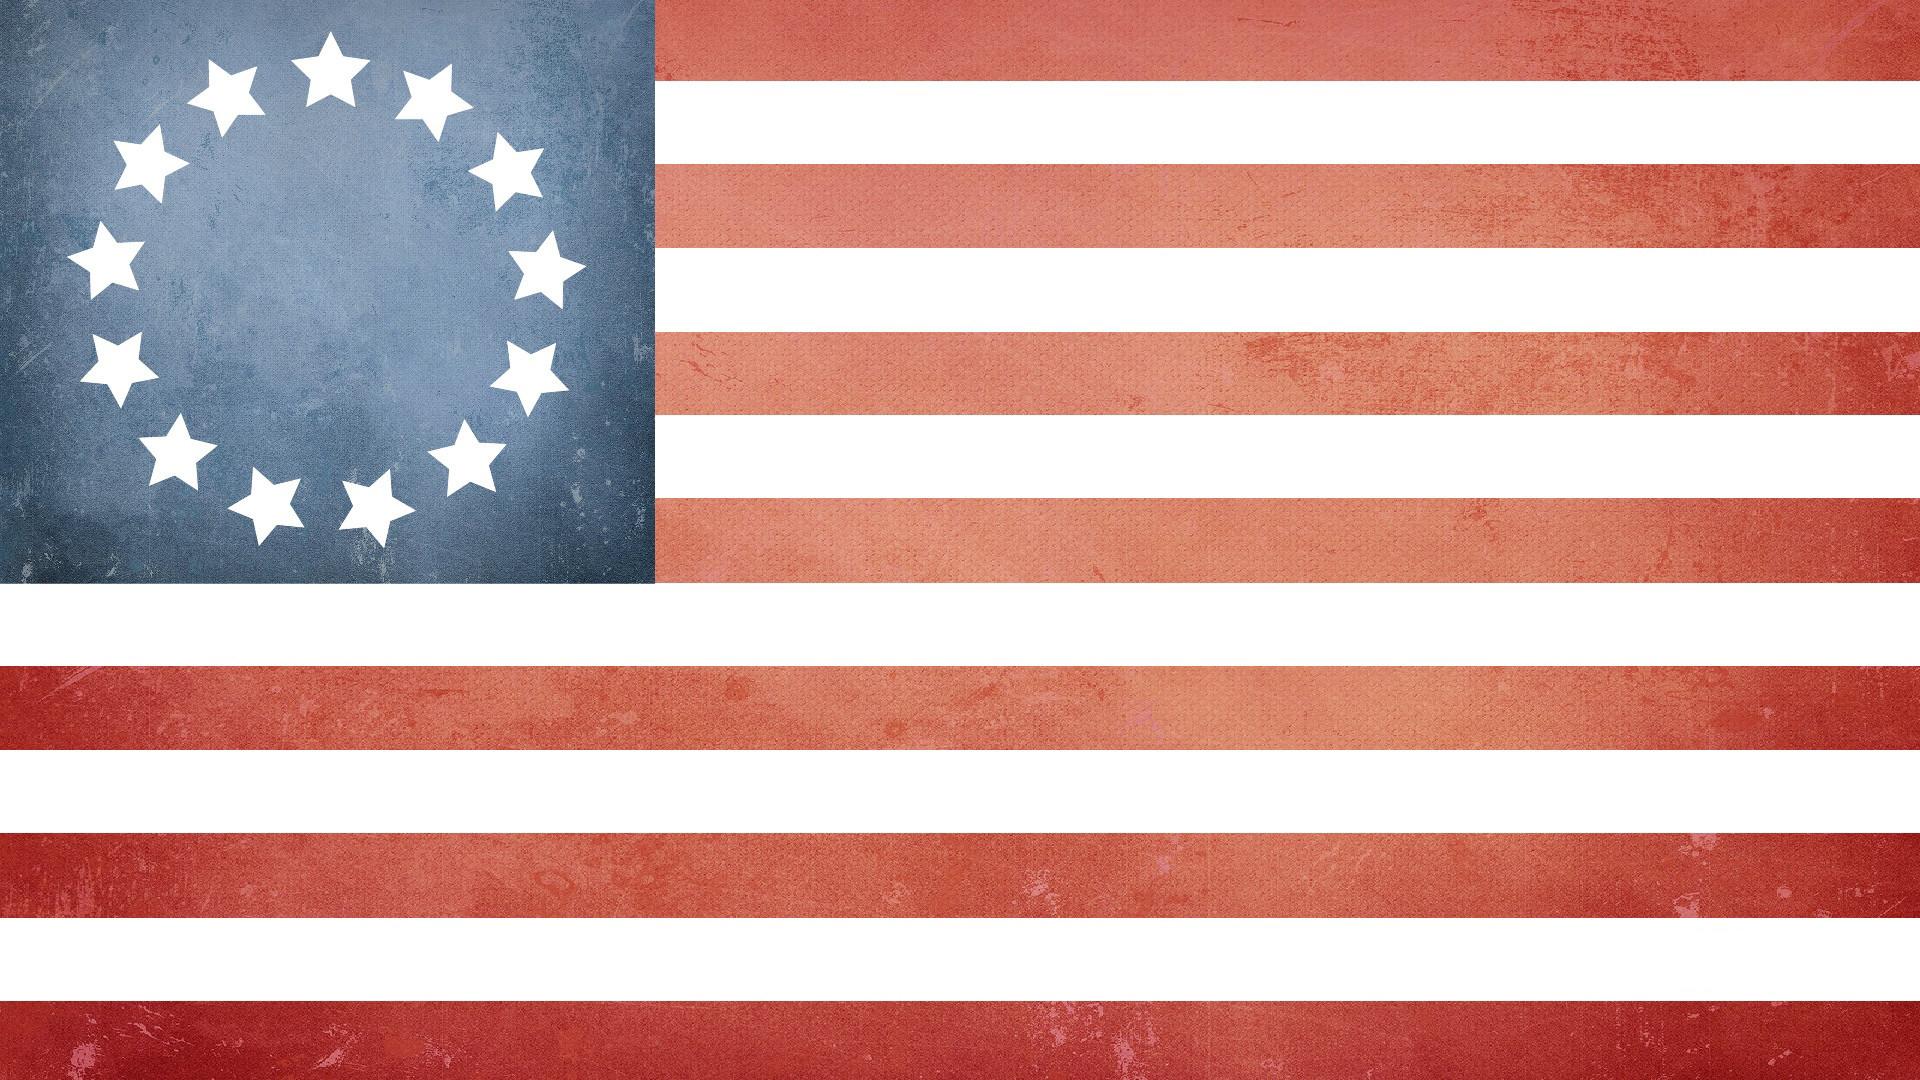 13 Star US Flag